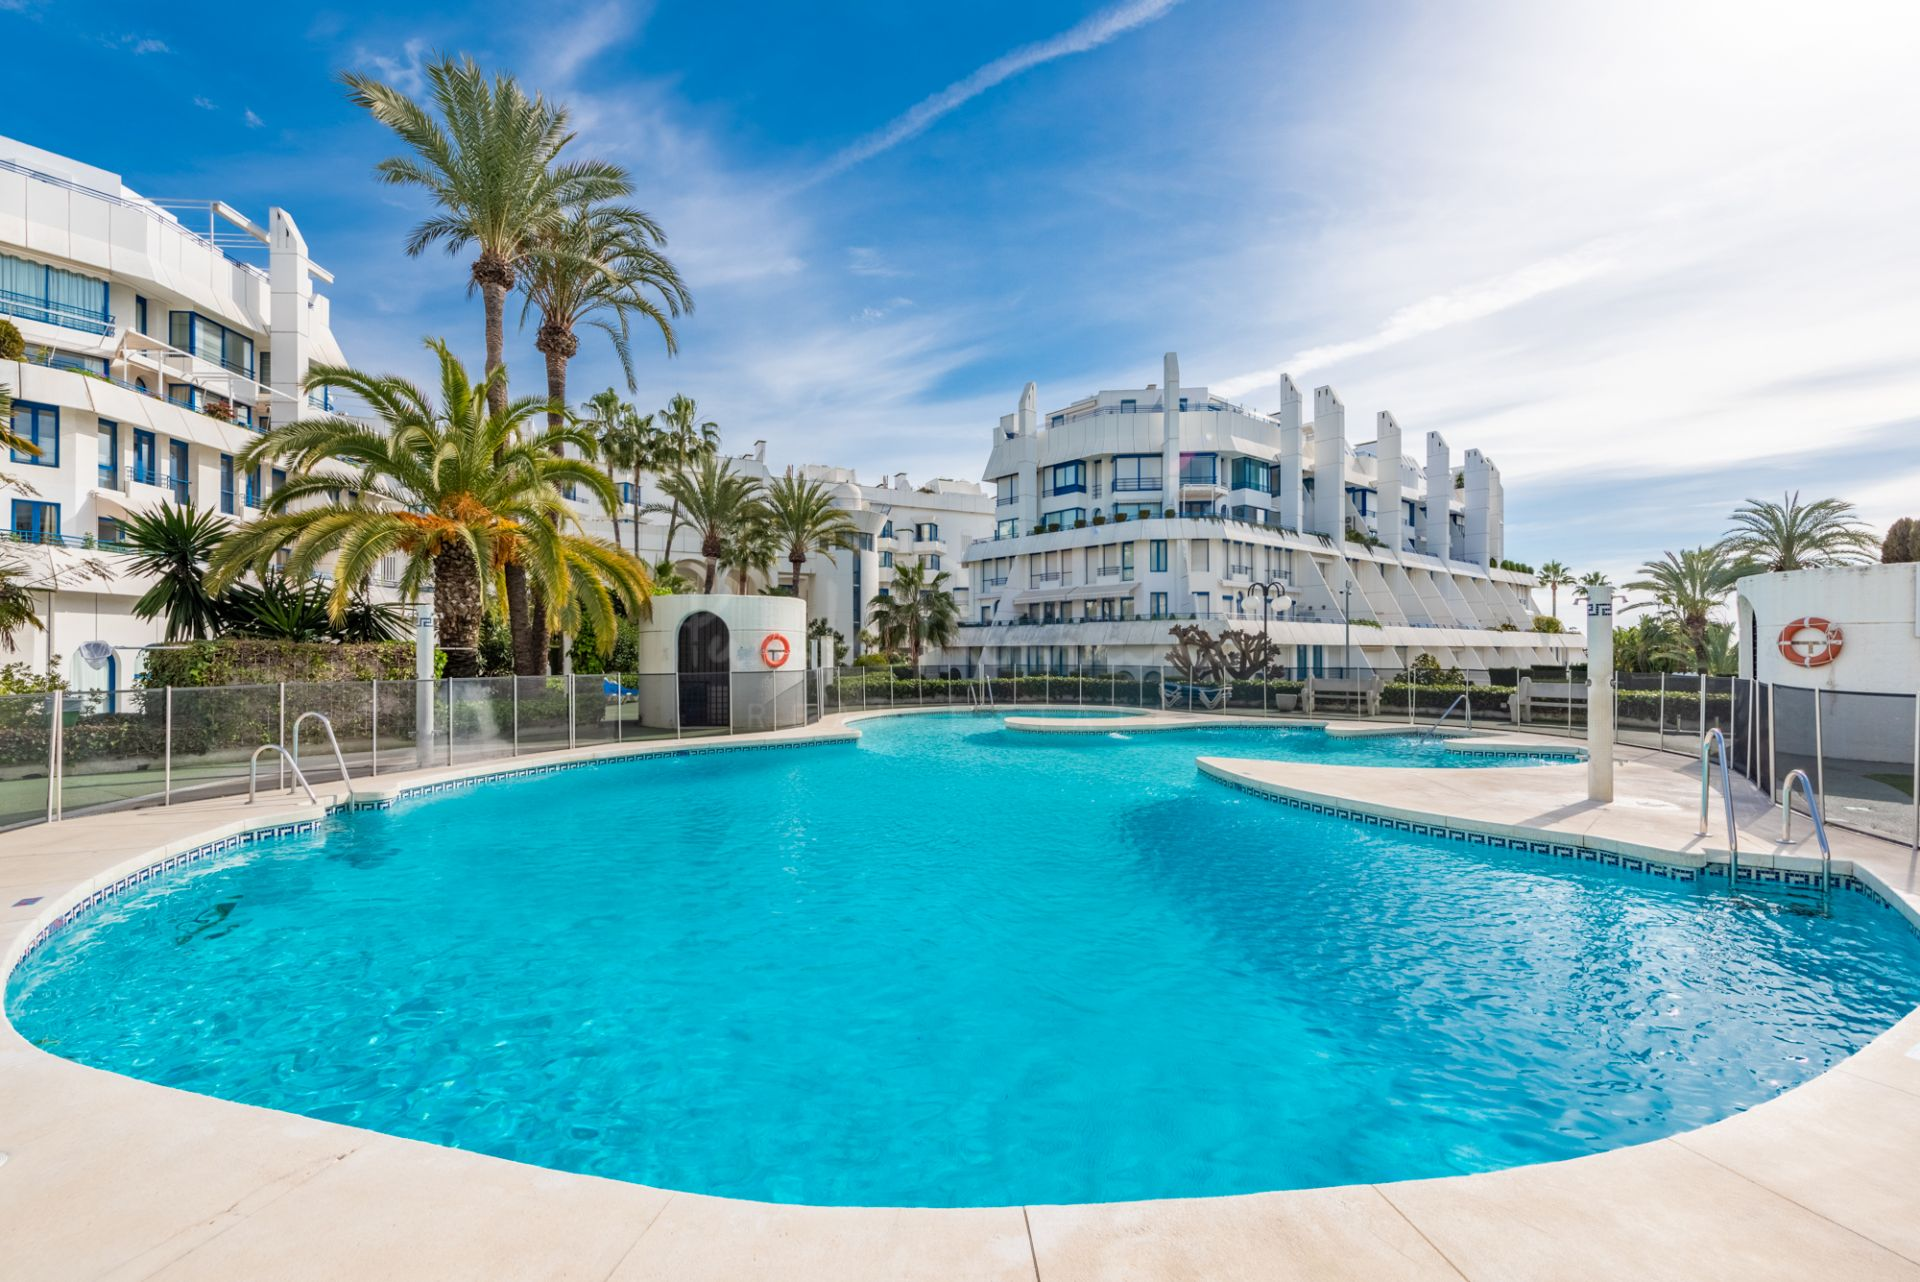 Duplex in Marbella House, Marbella